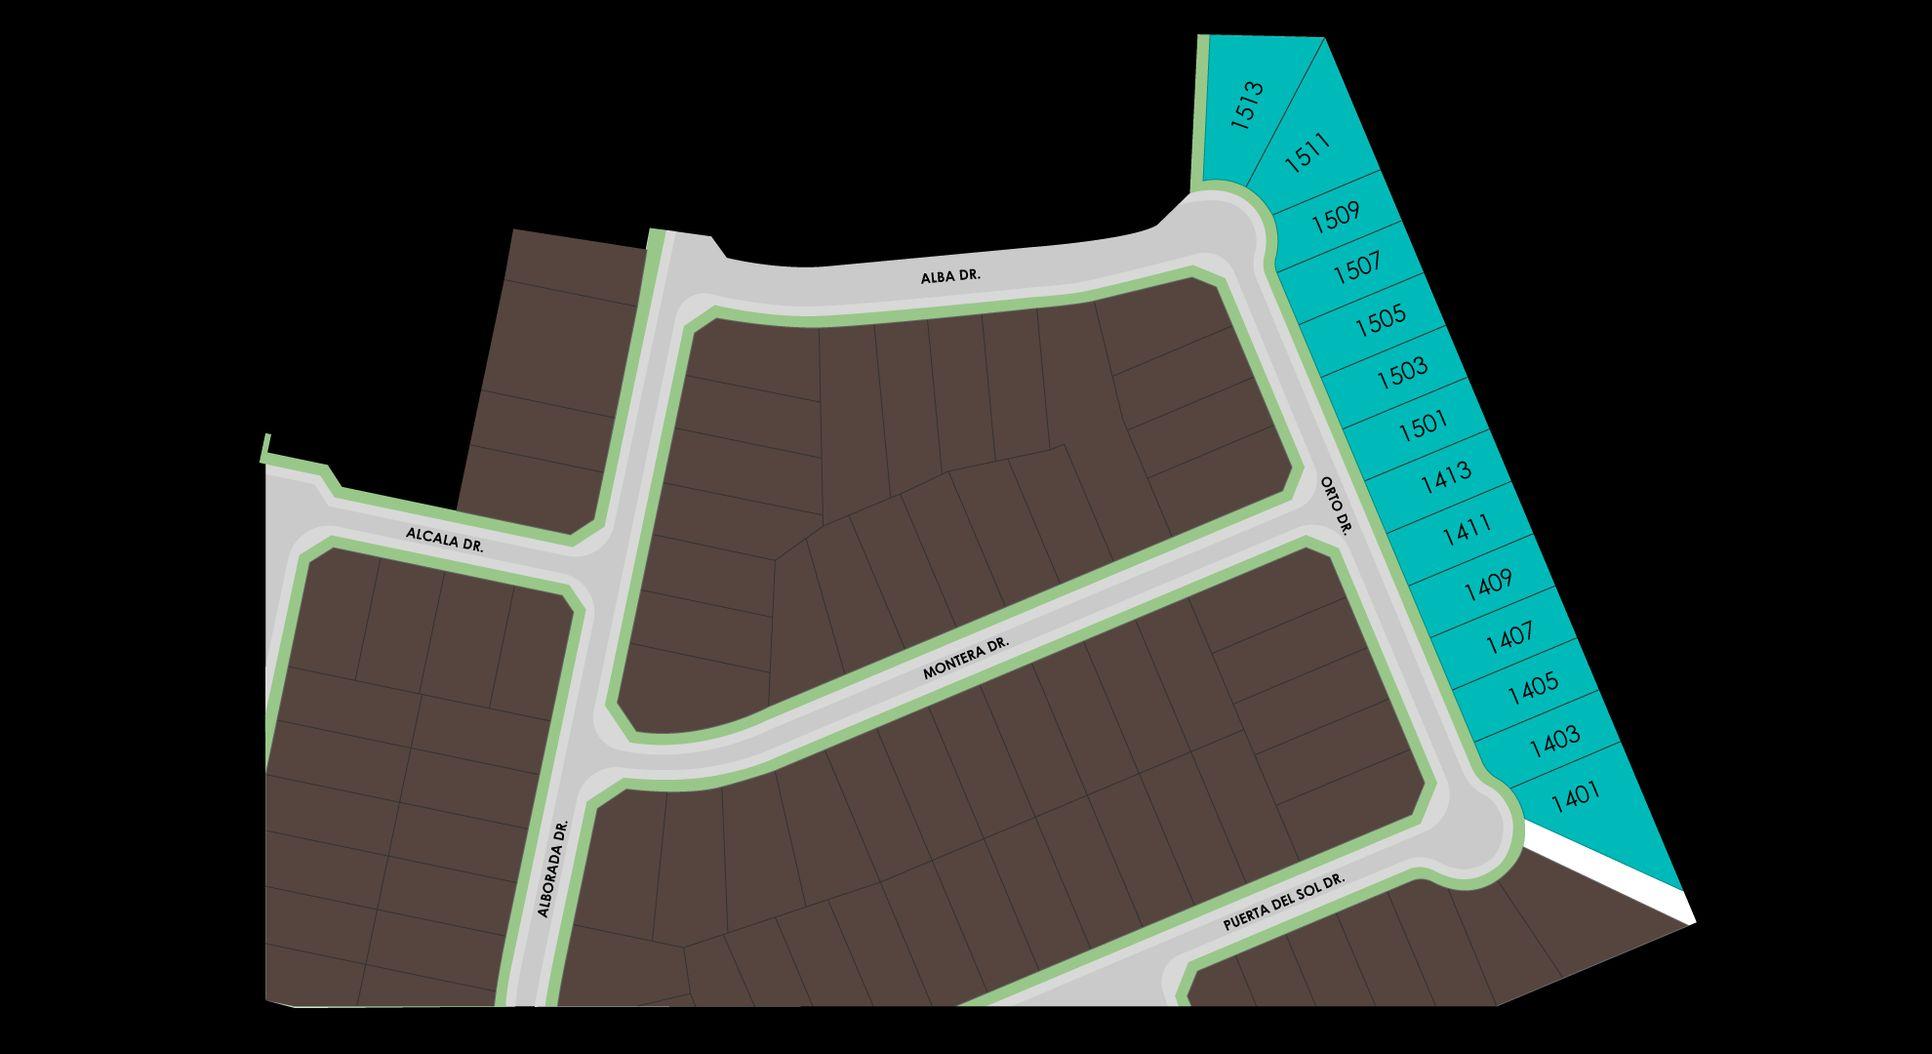 San Isidro Northeast - Puerta Del Sol Phase I